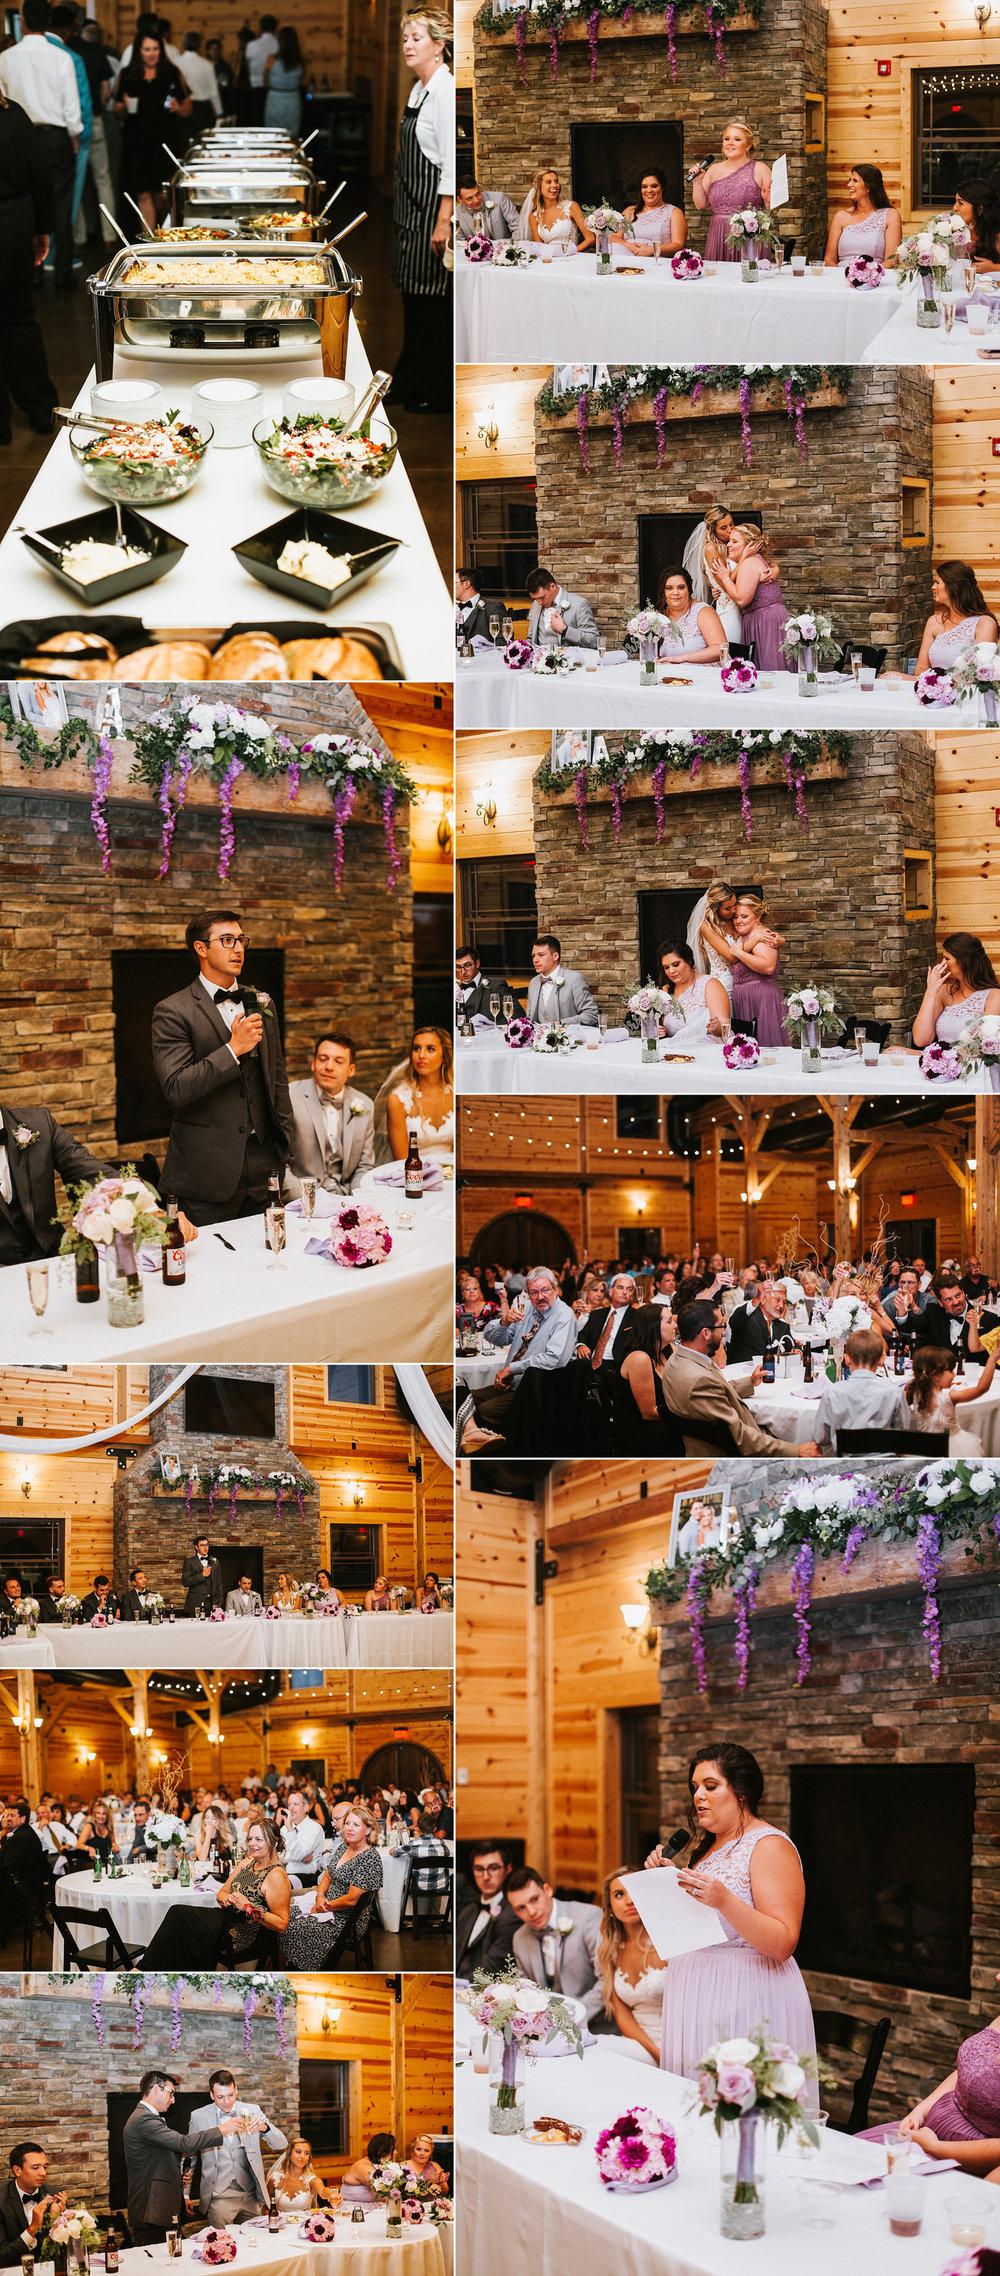 Brooke Townsend Photography - Cincinnati Wedding Photographer (198 of 230).jpg